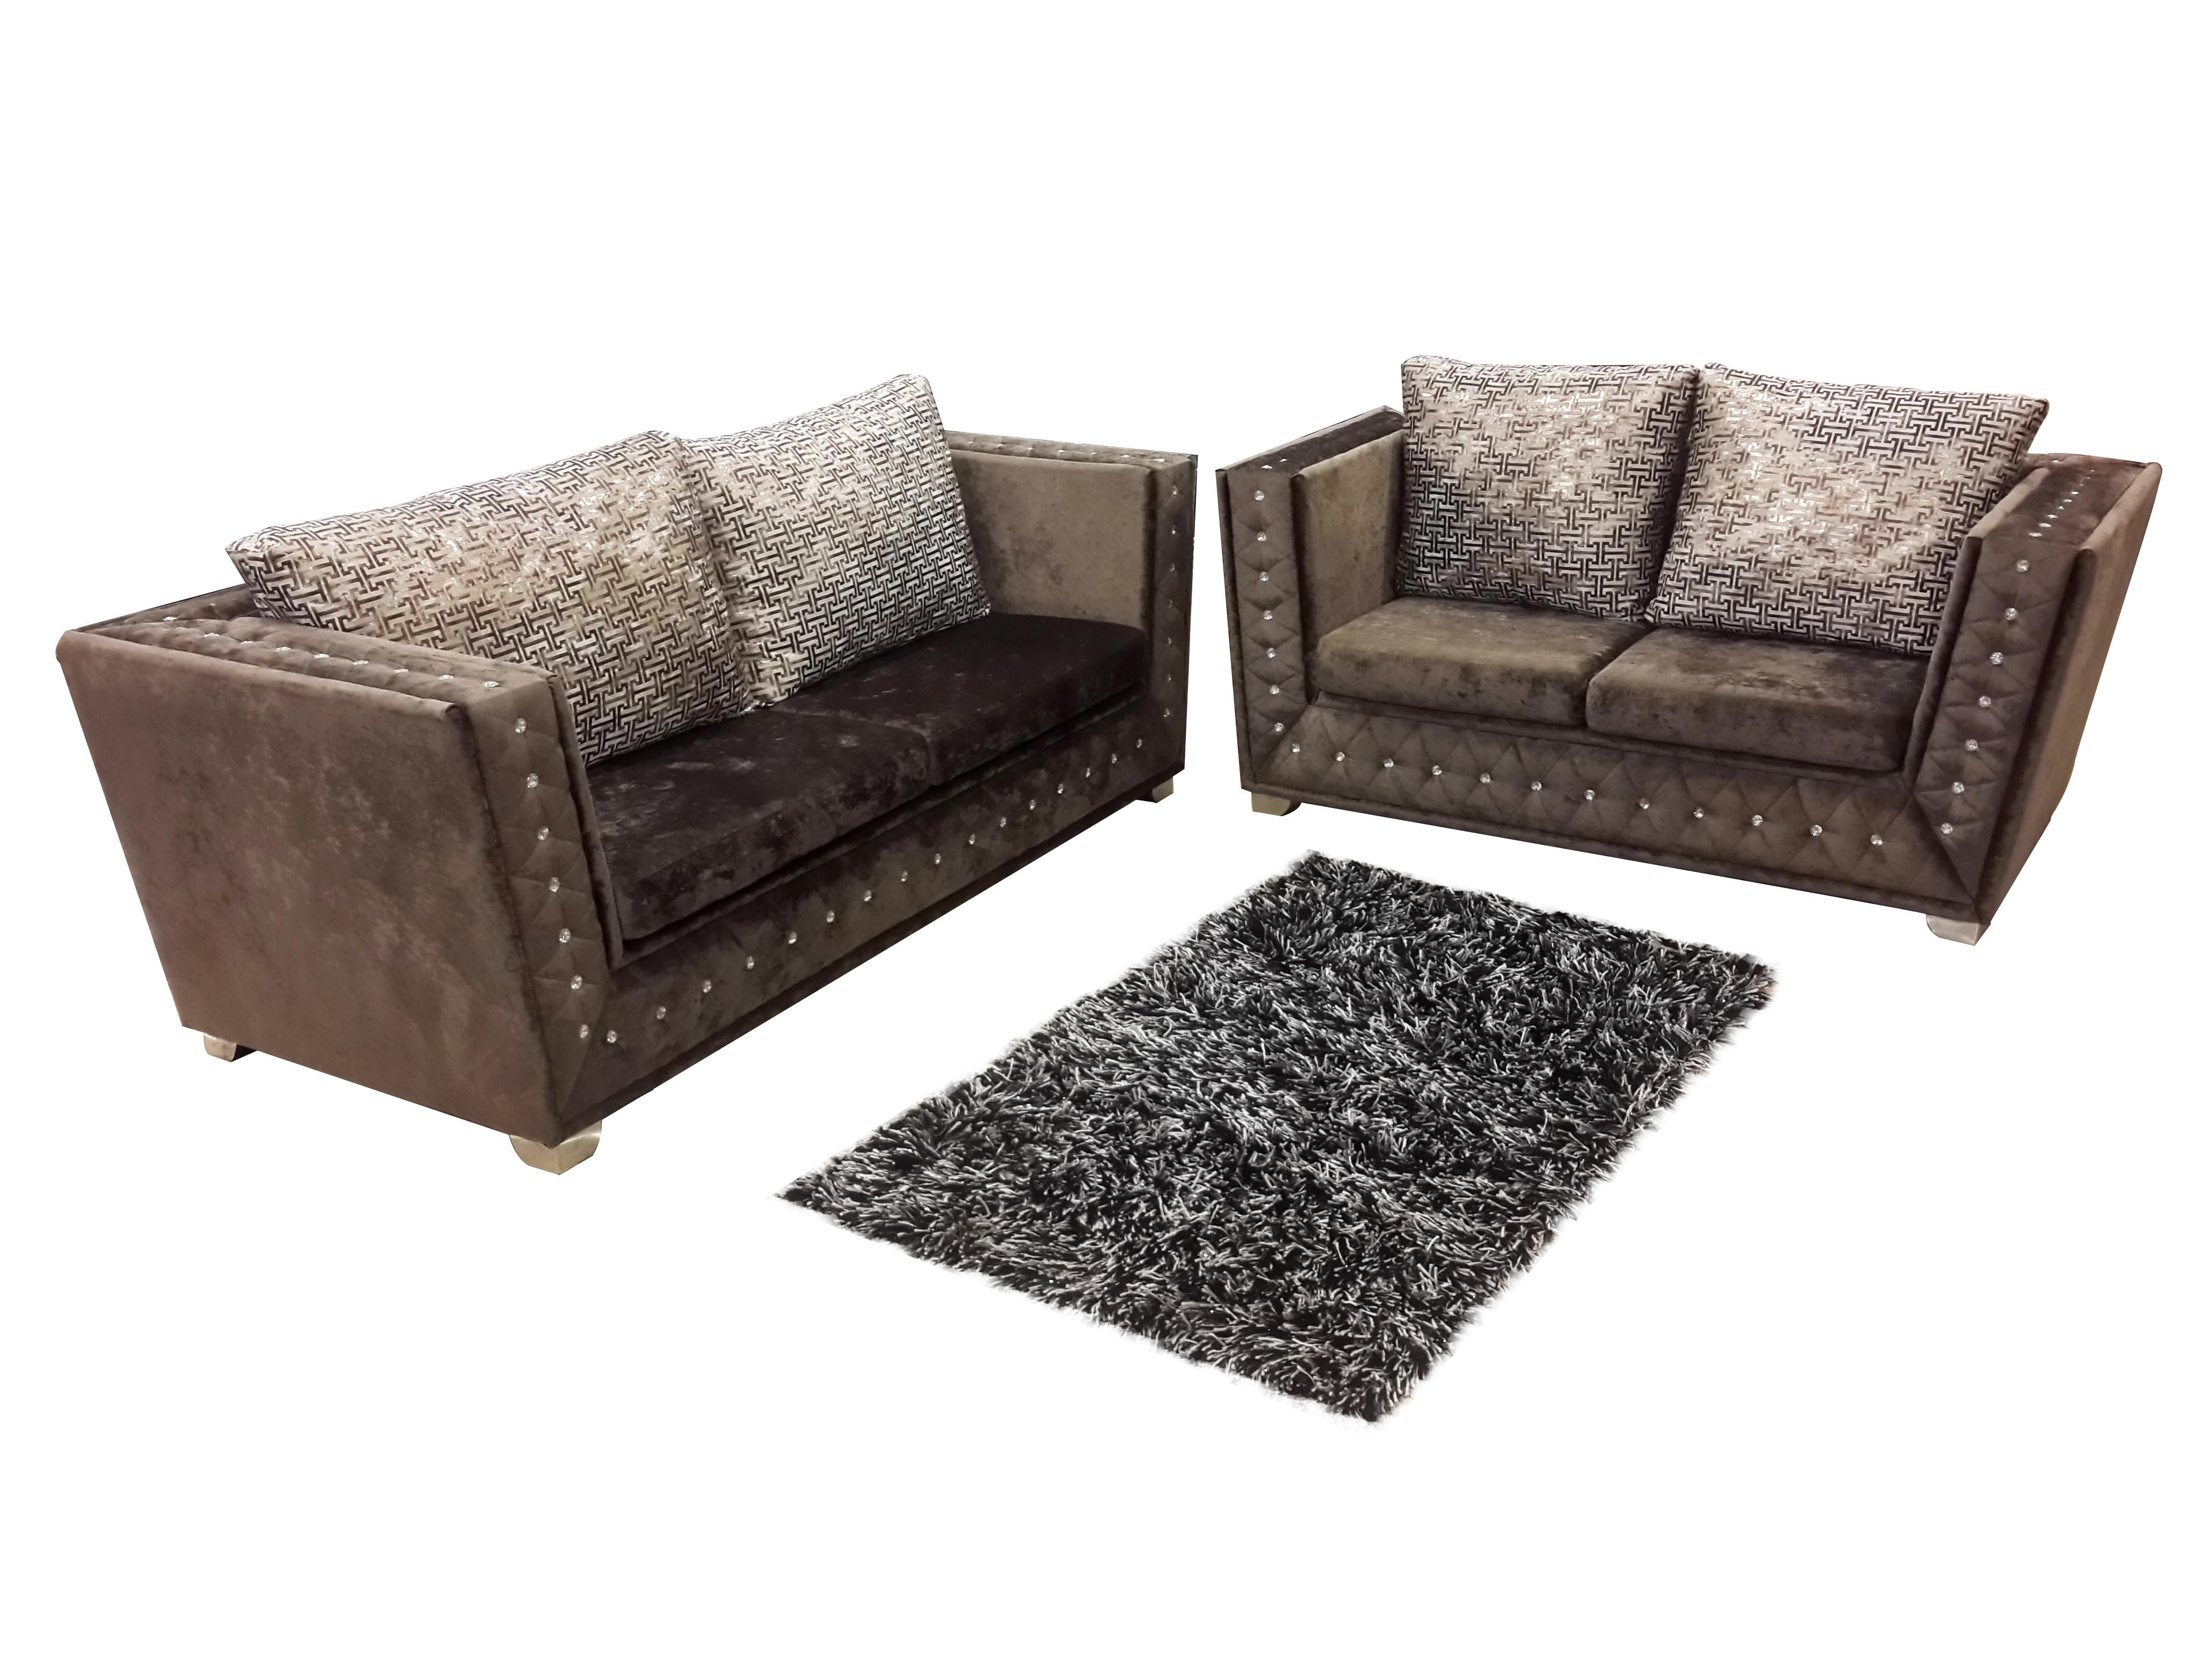 Buy livanto 3 2 sofa set at onlinesofadesign for Sofa set purchase